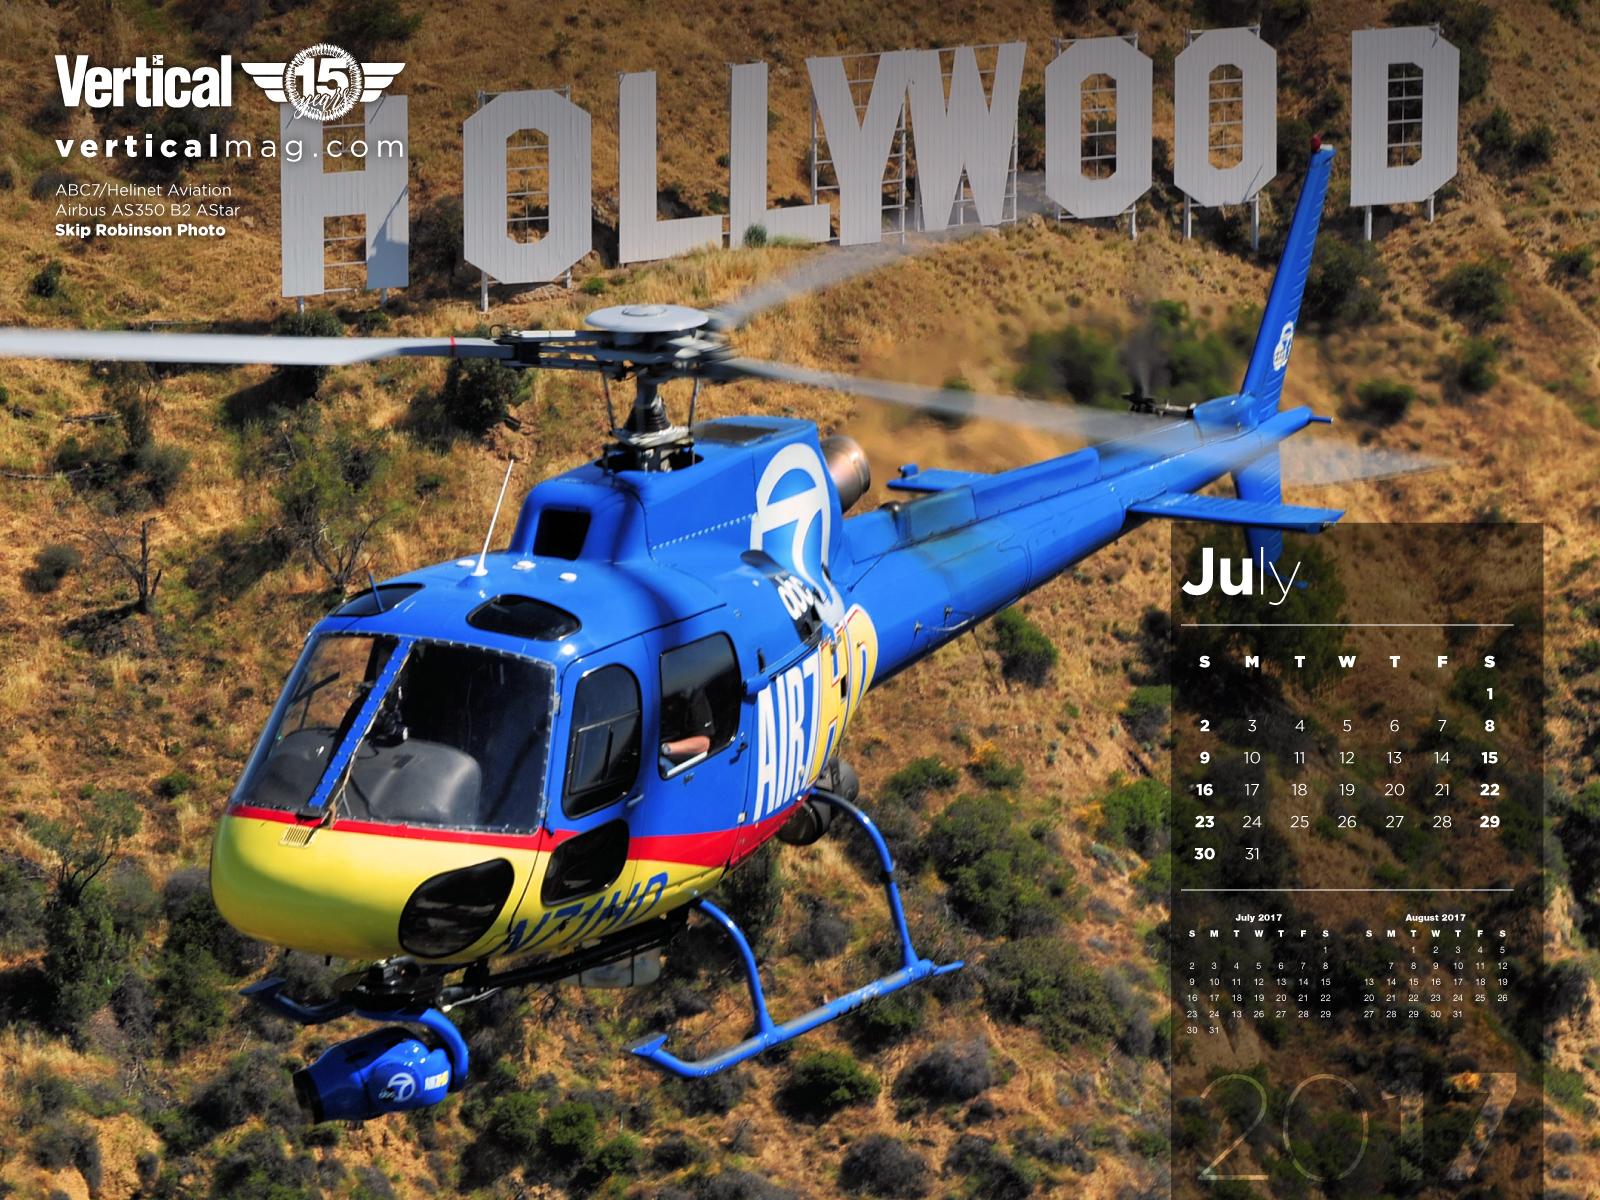 July calendars